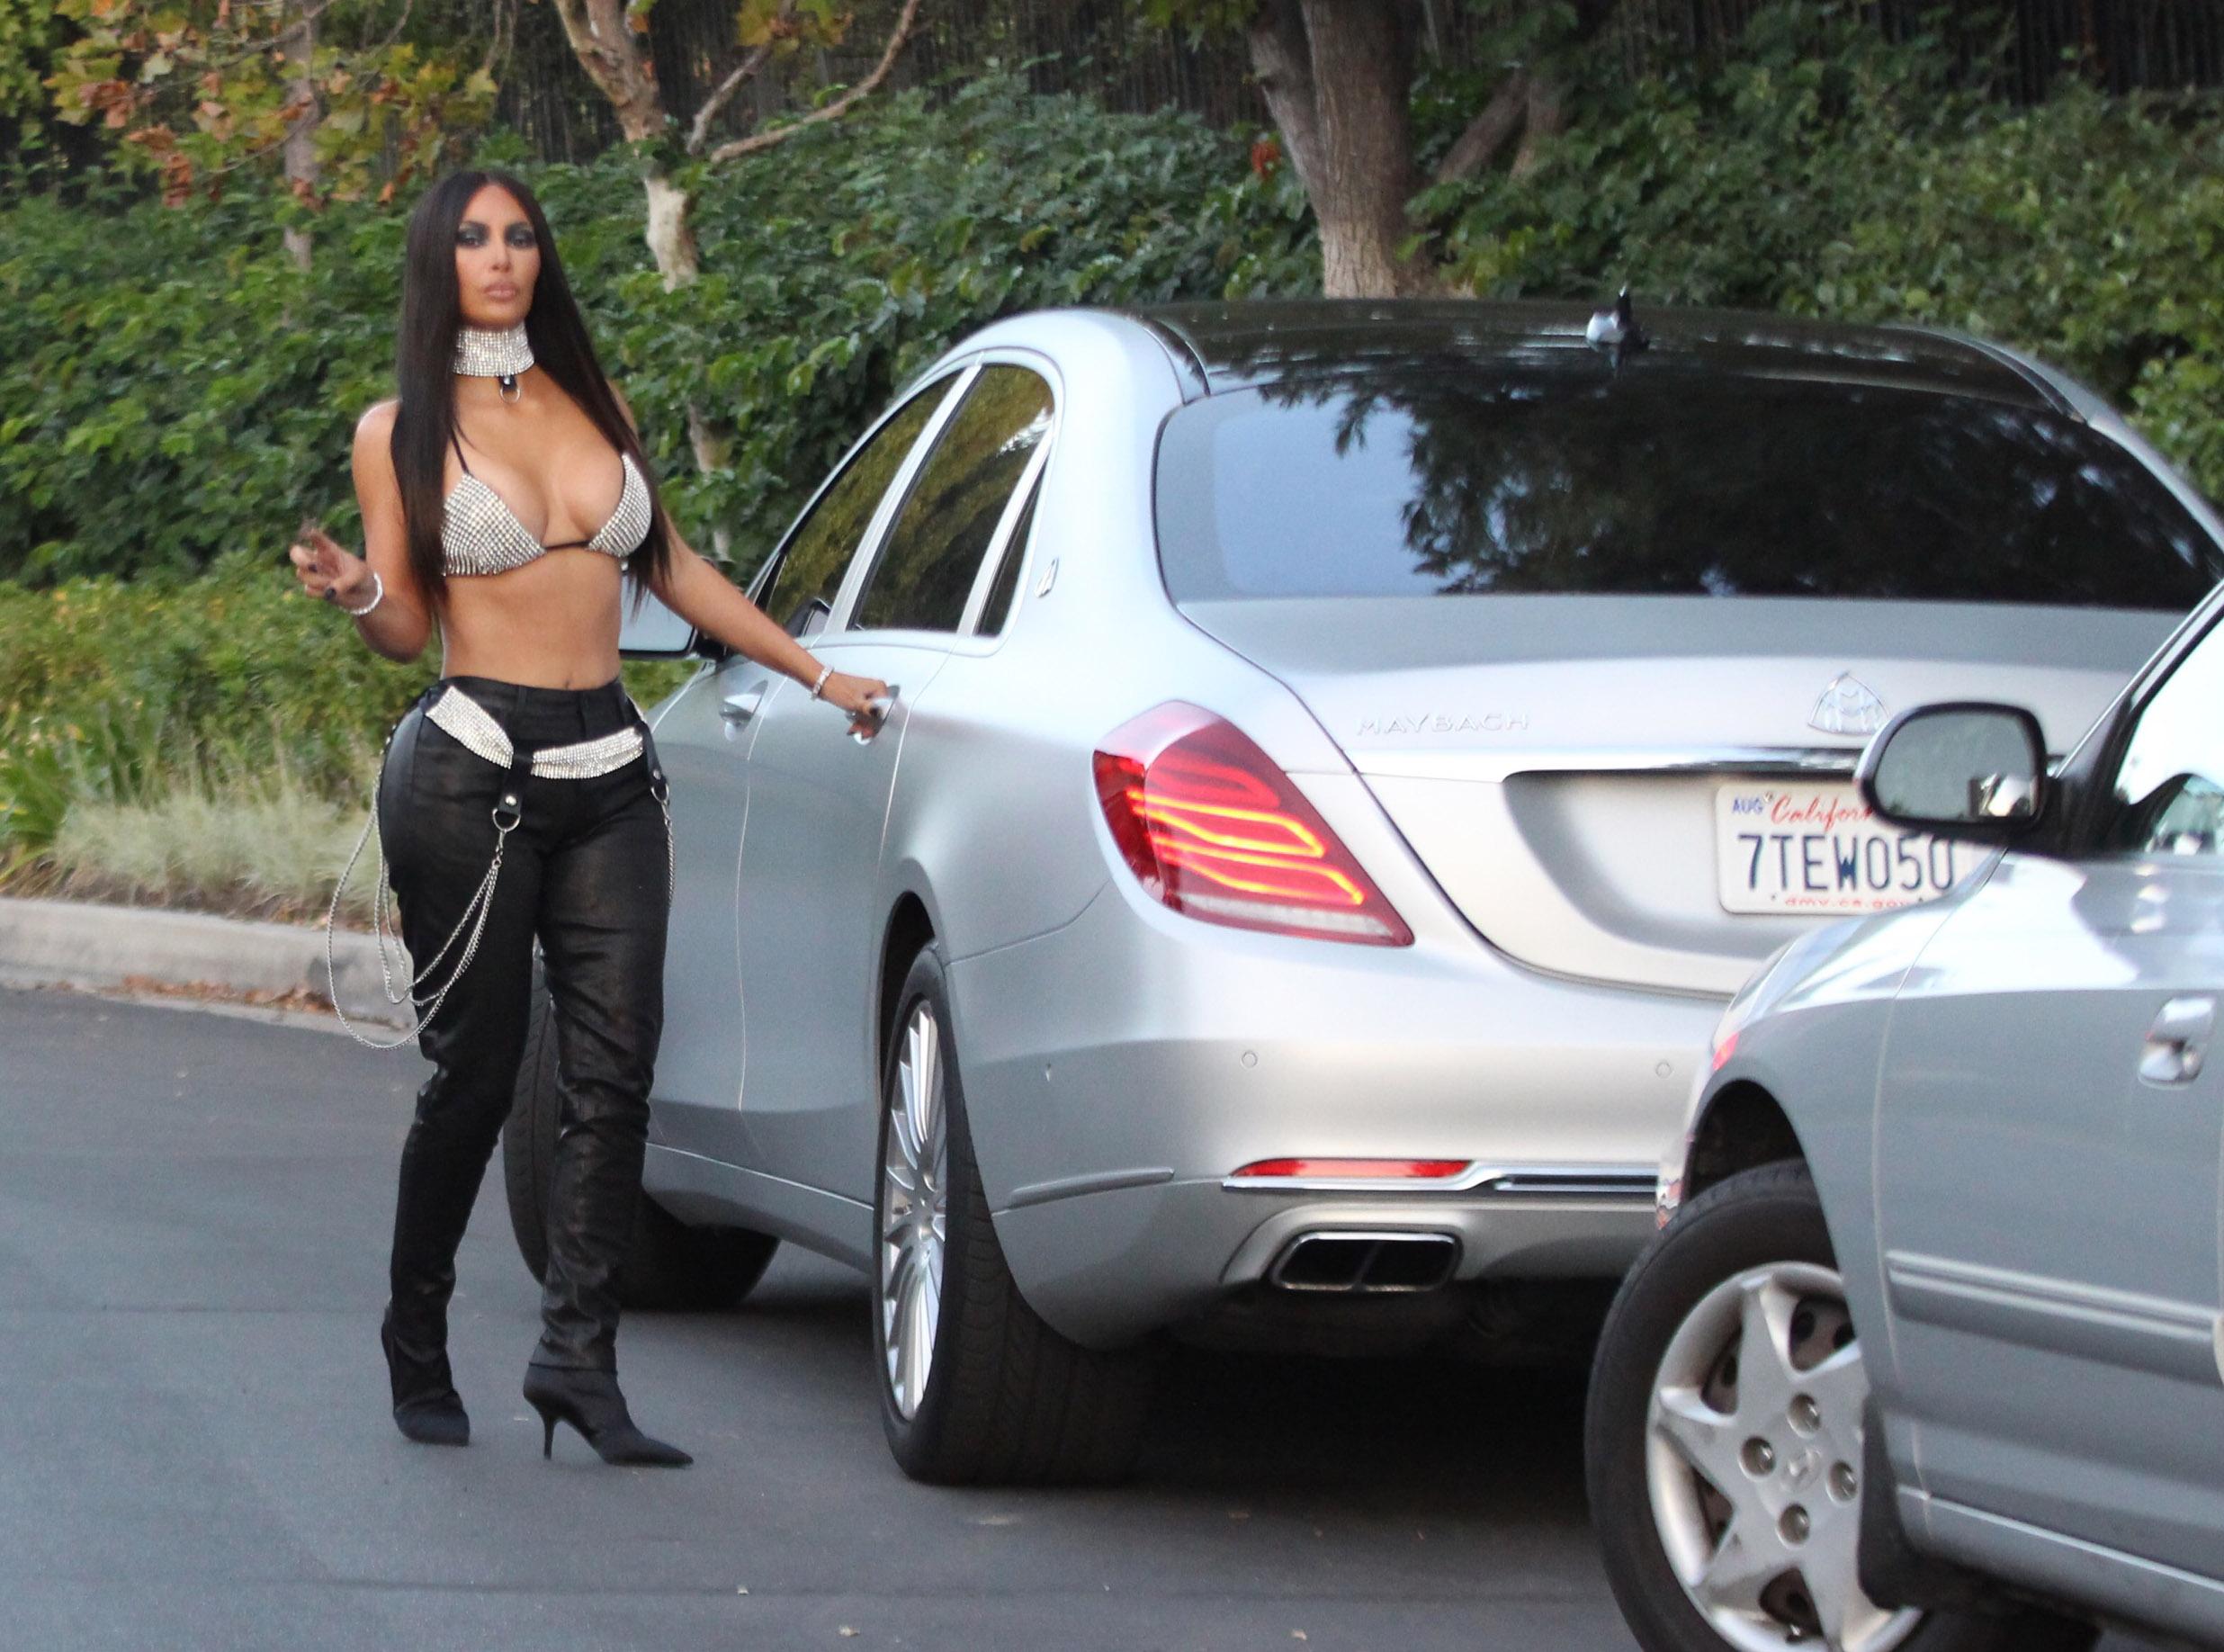 Kim Kardashian dressed as Aaliyah on Saturday night